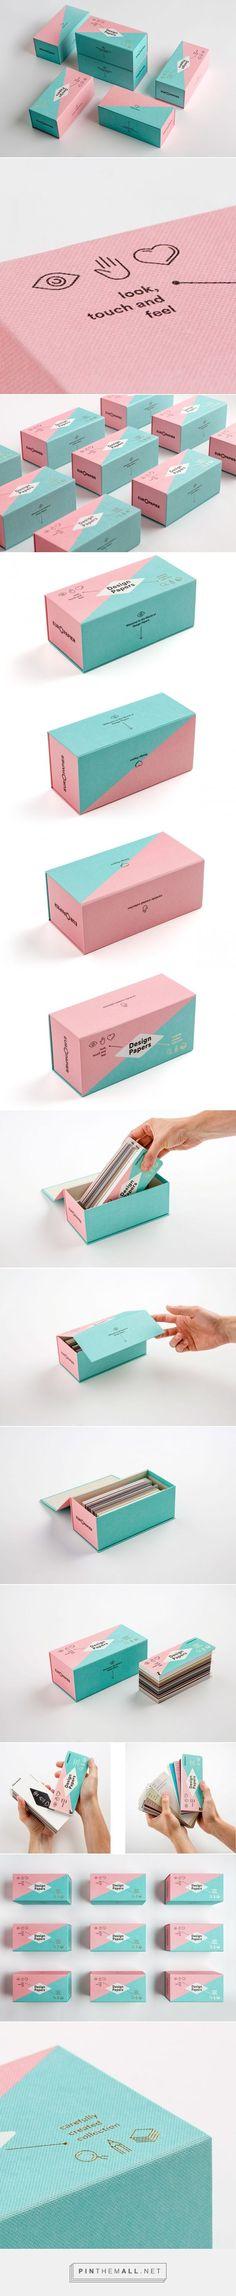 Design Papers 2016 packaging design by Metaklinika Logo Design, Web Design, Design Poster, Graphic Design Branding, Identity Design, Layout Design, Brand Identity, Brand Design, Branding And Packaging